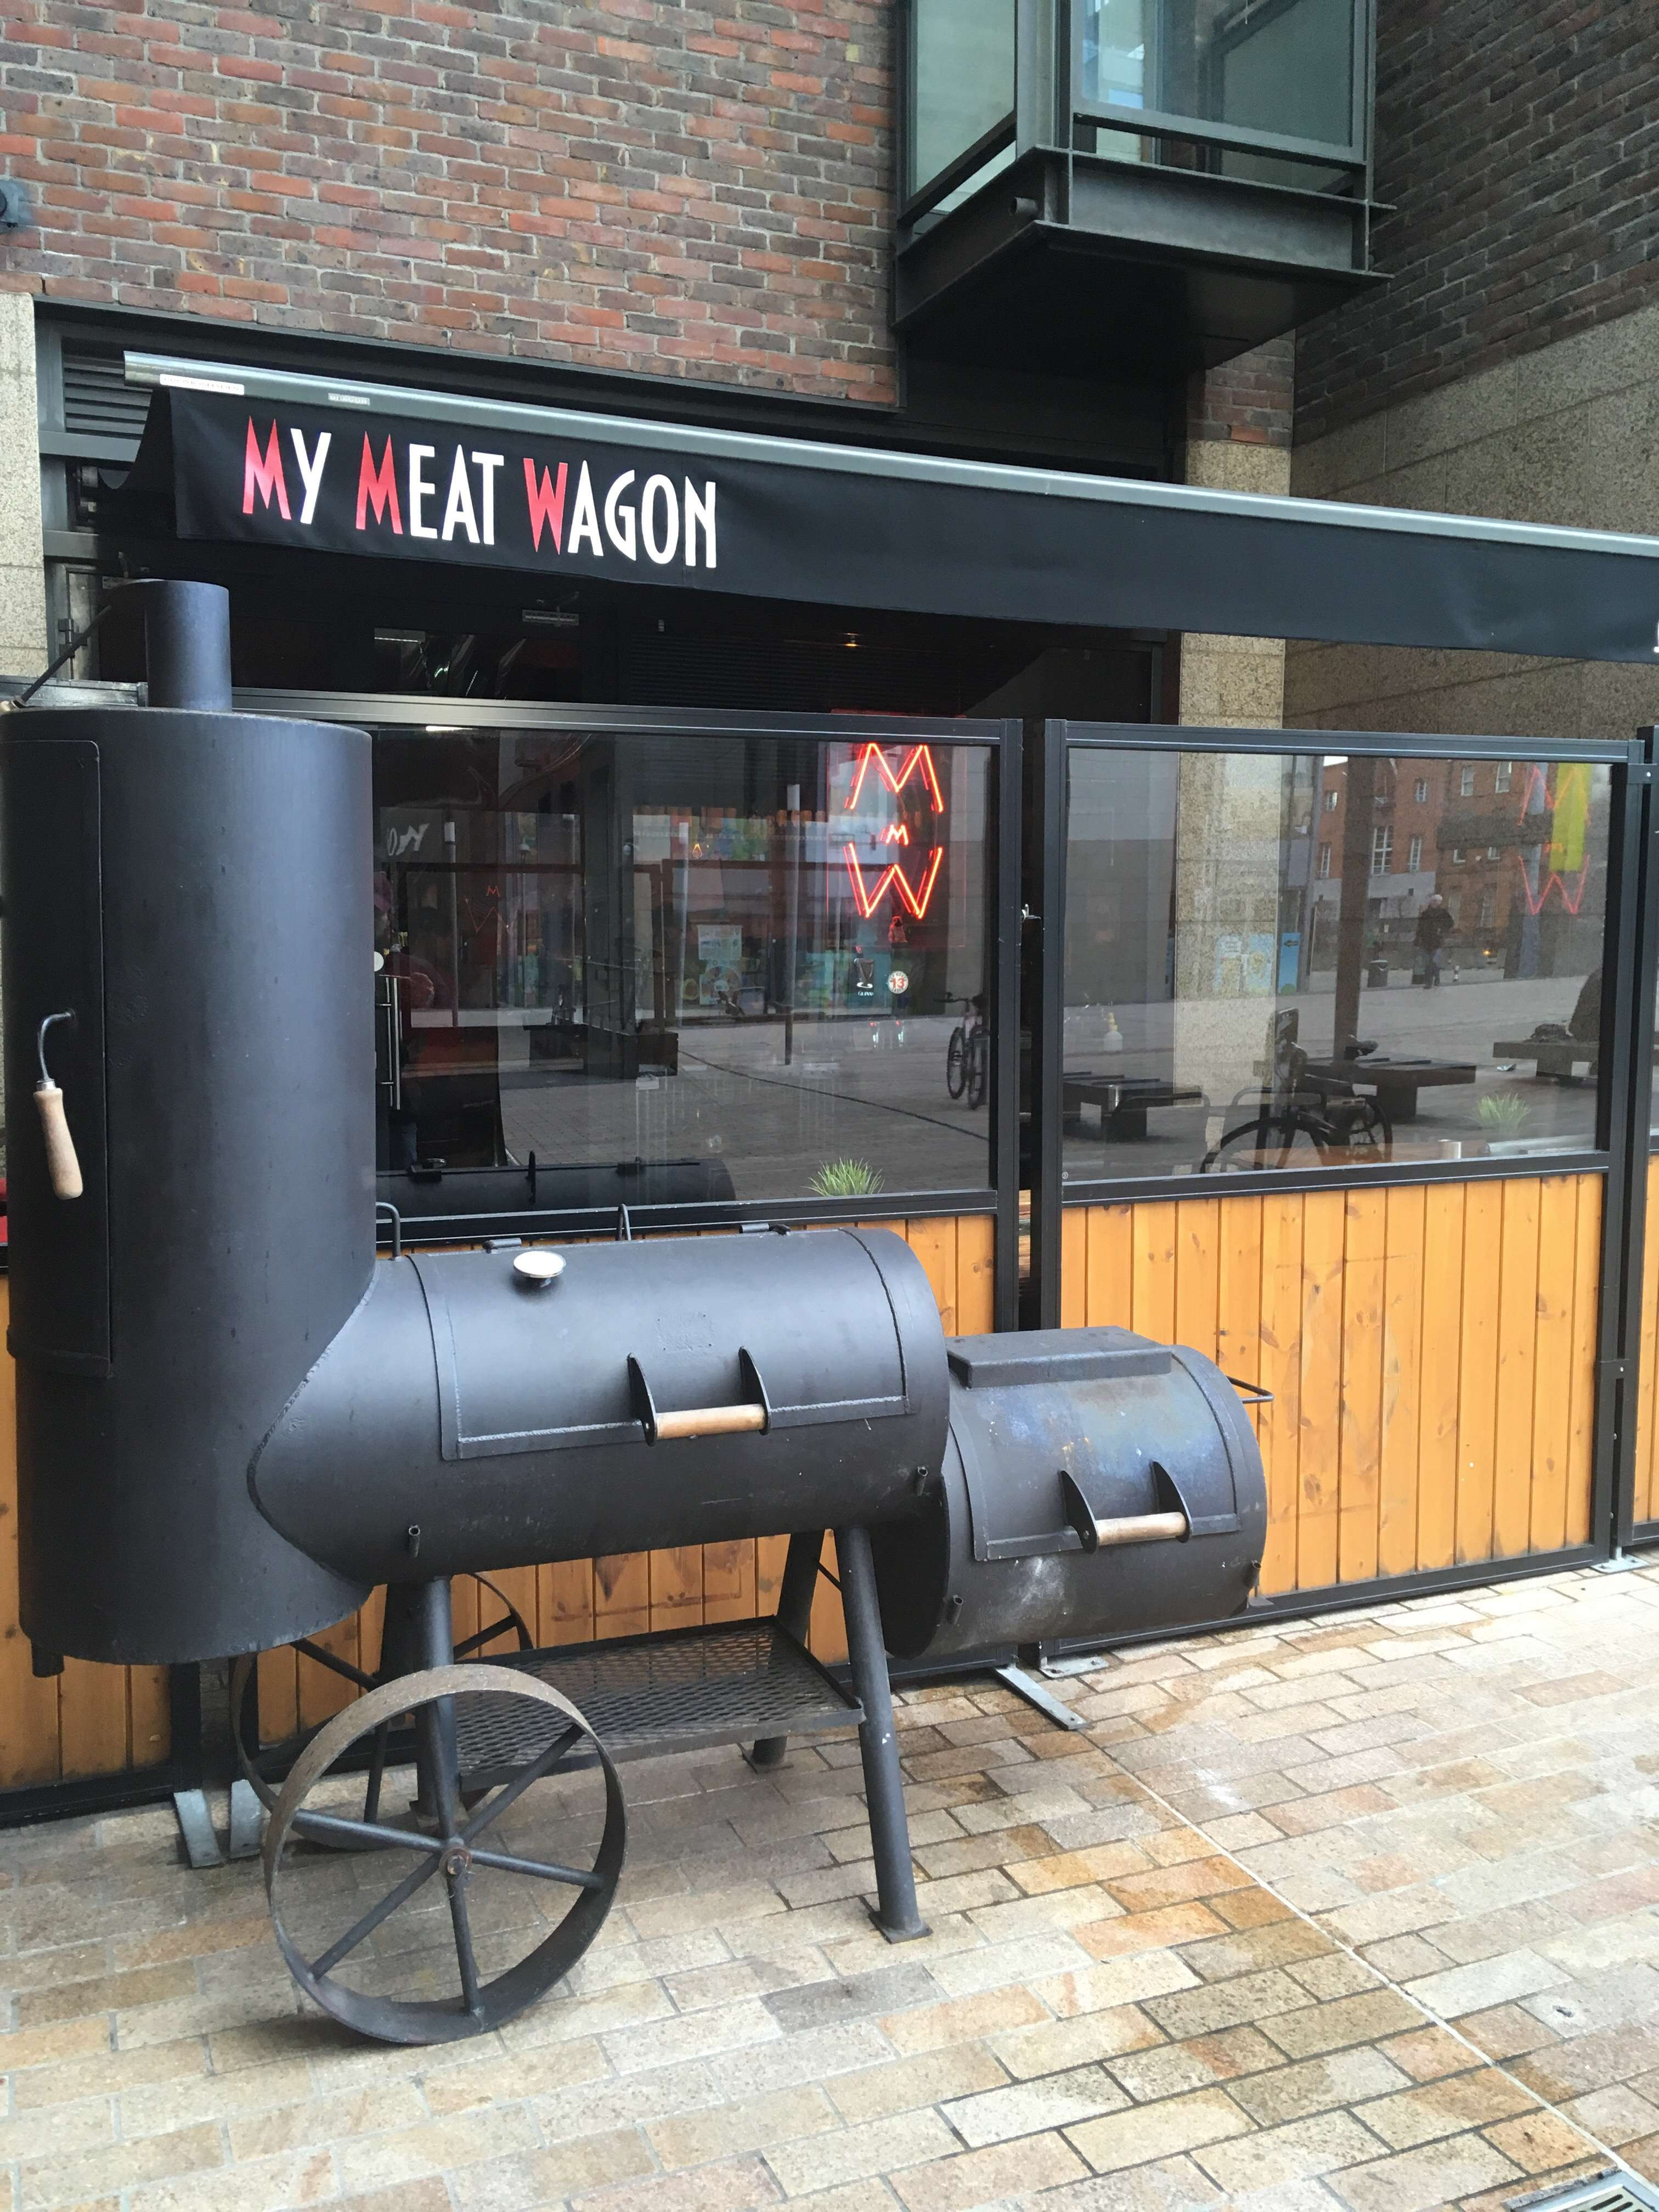 My Meat Wagon